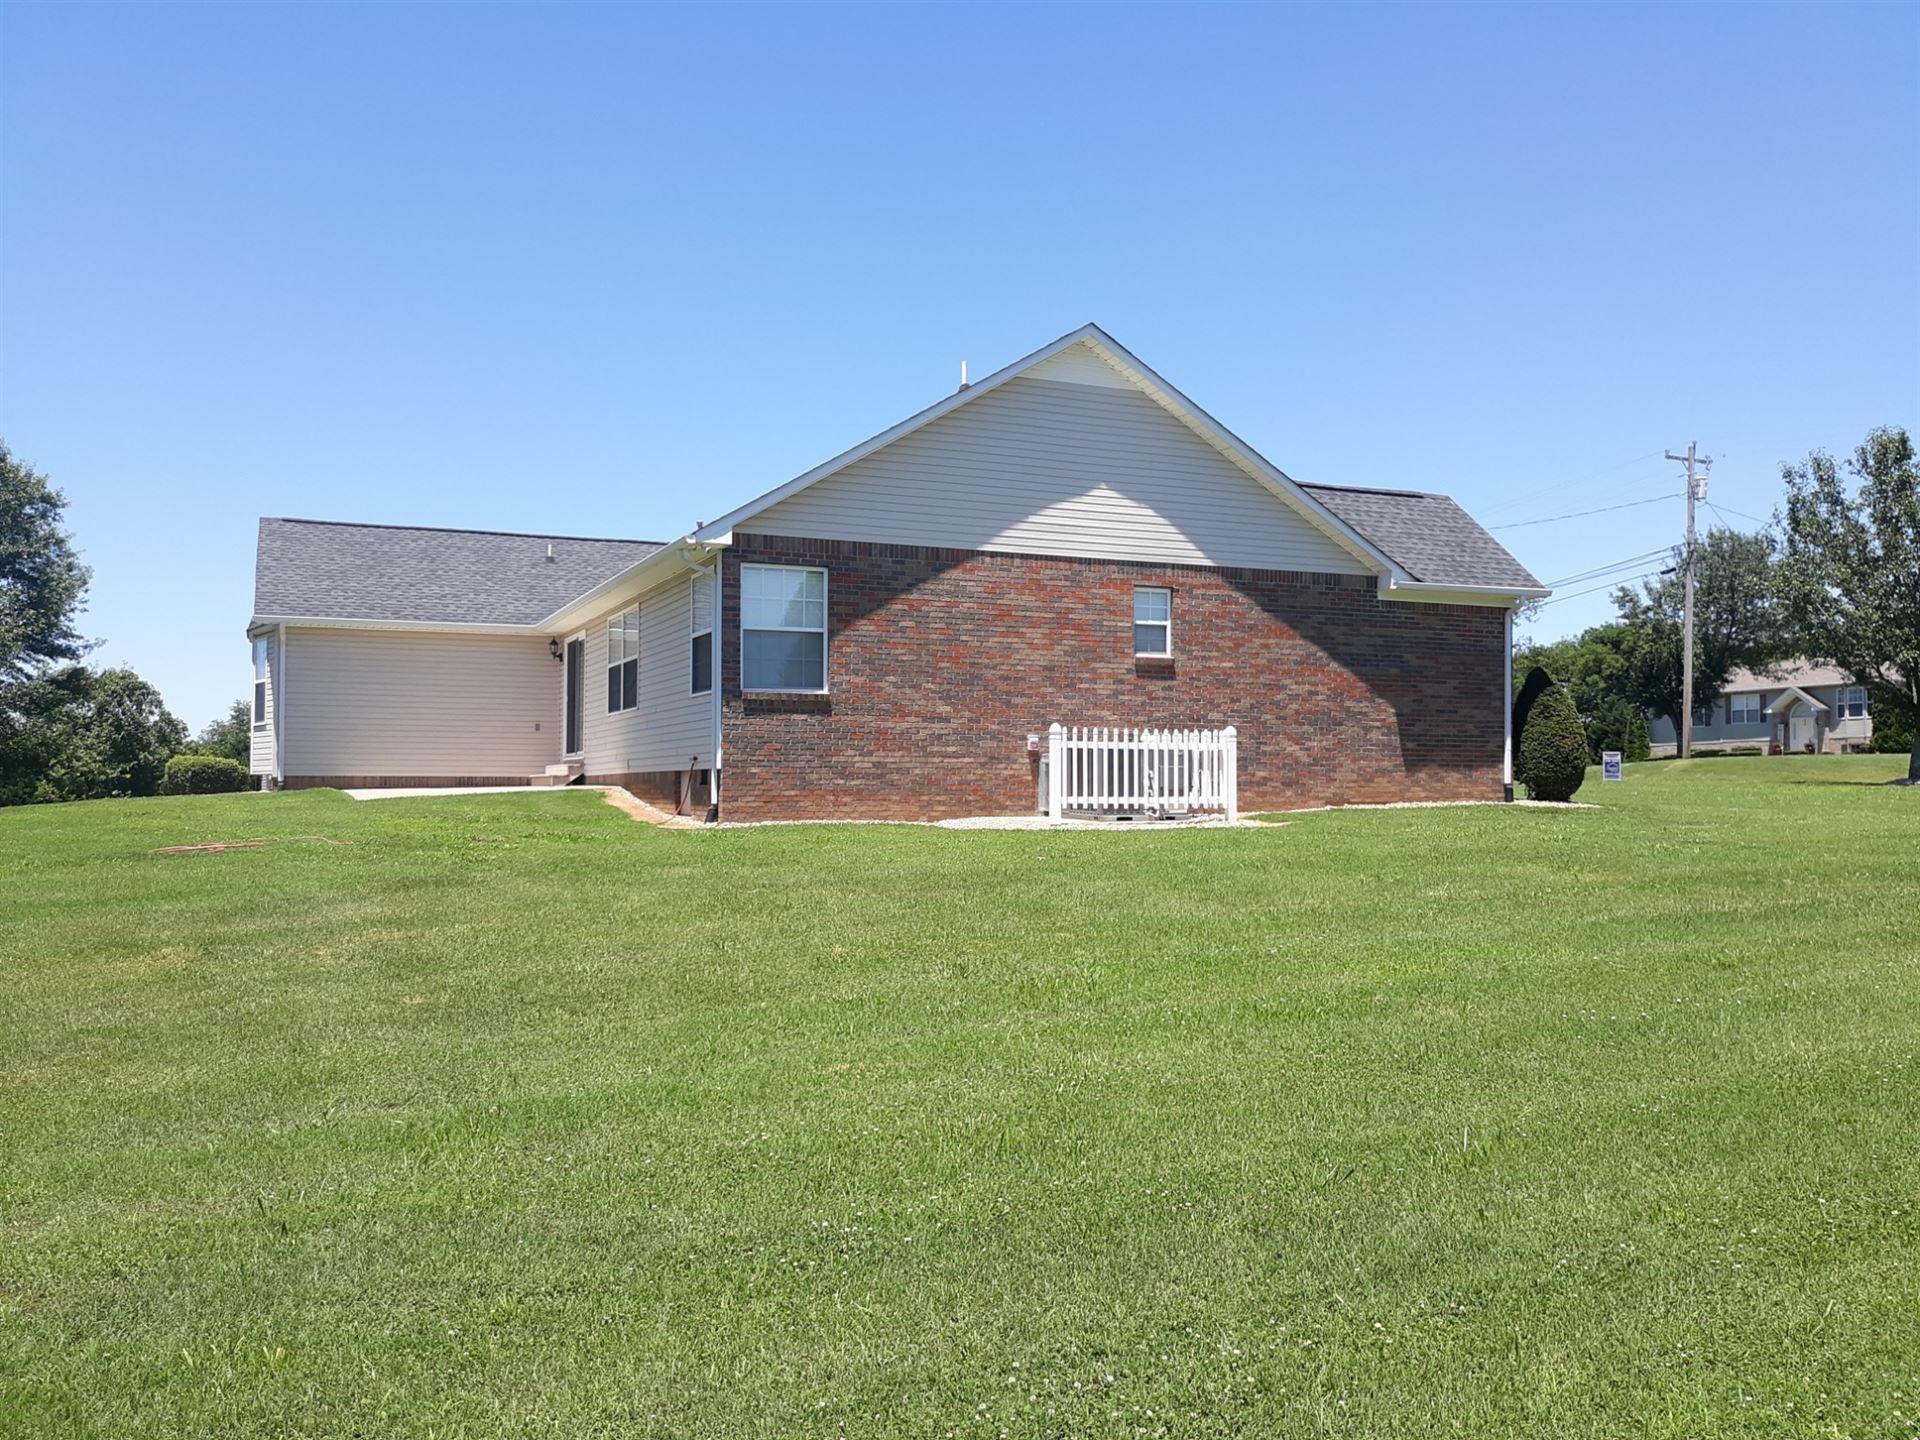 Photo of 261 Red Oak Trl, Spring Hill, TN 37174 (MLS # 2262920)